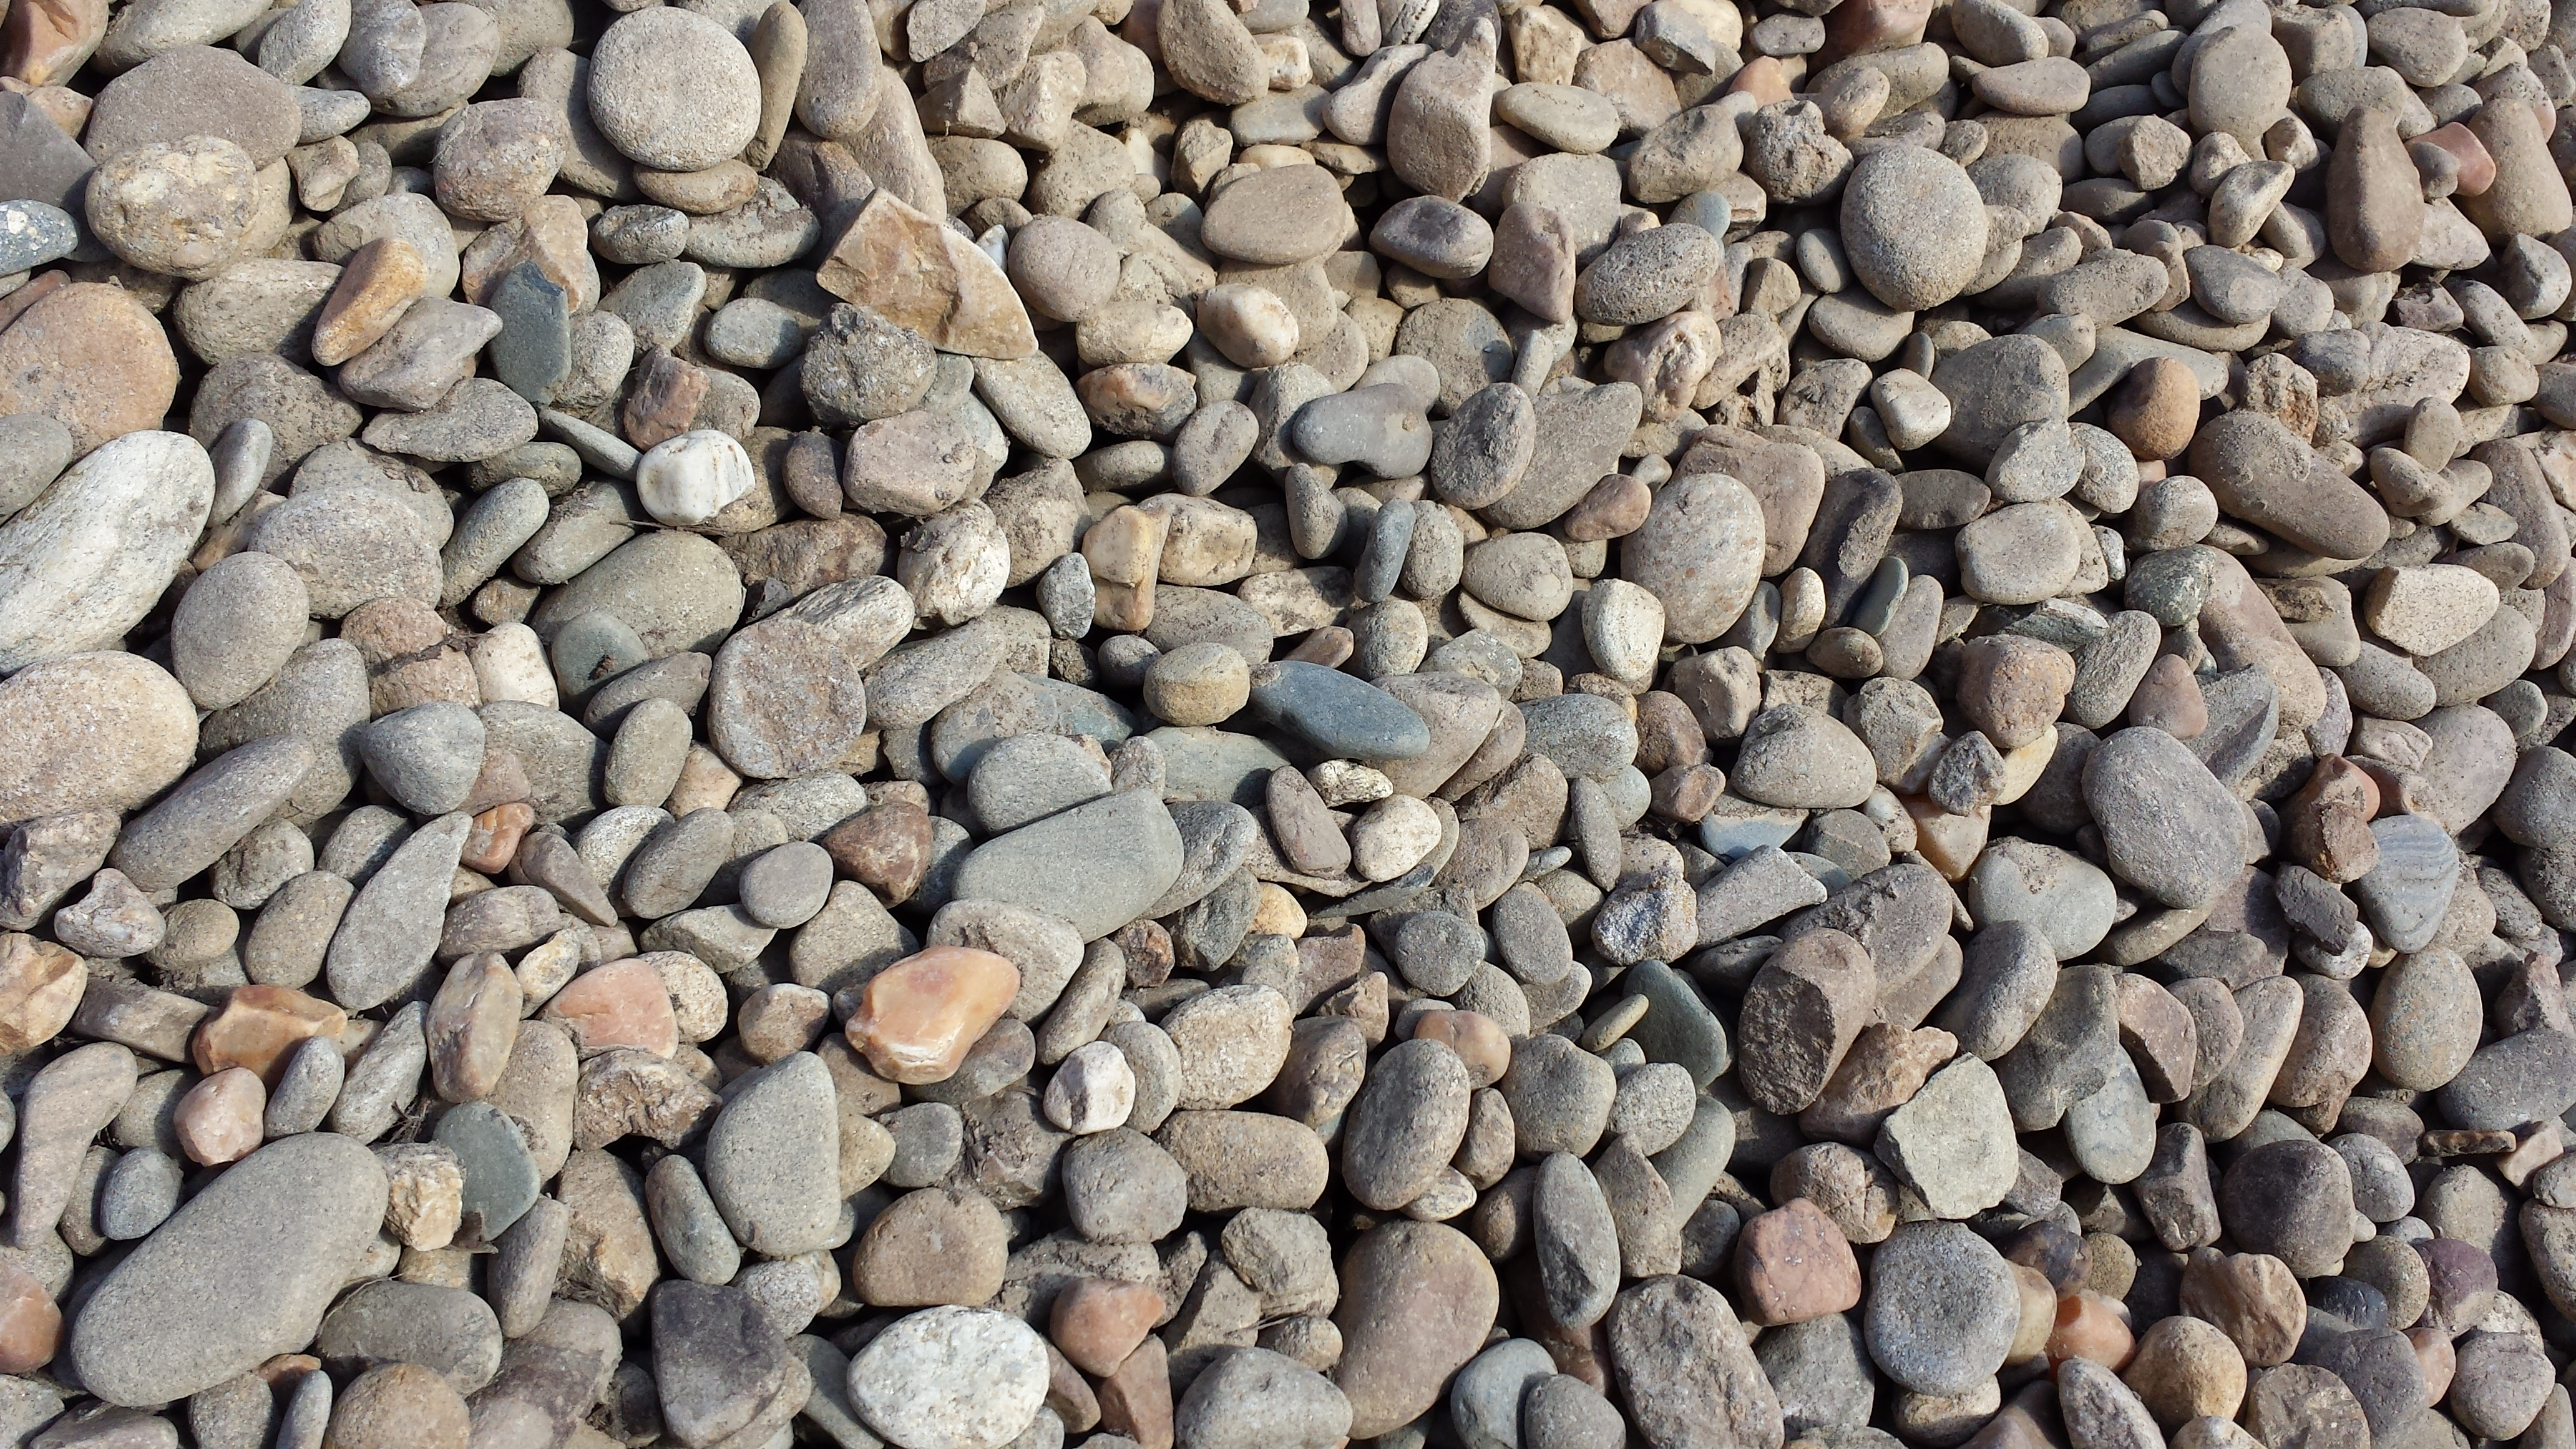 Rock and Stone | Mulch Bucket,Myrtle Beach, SC